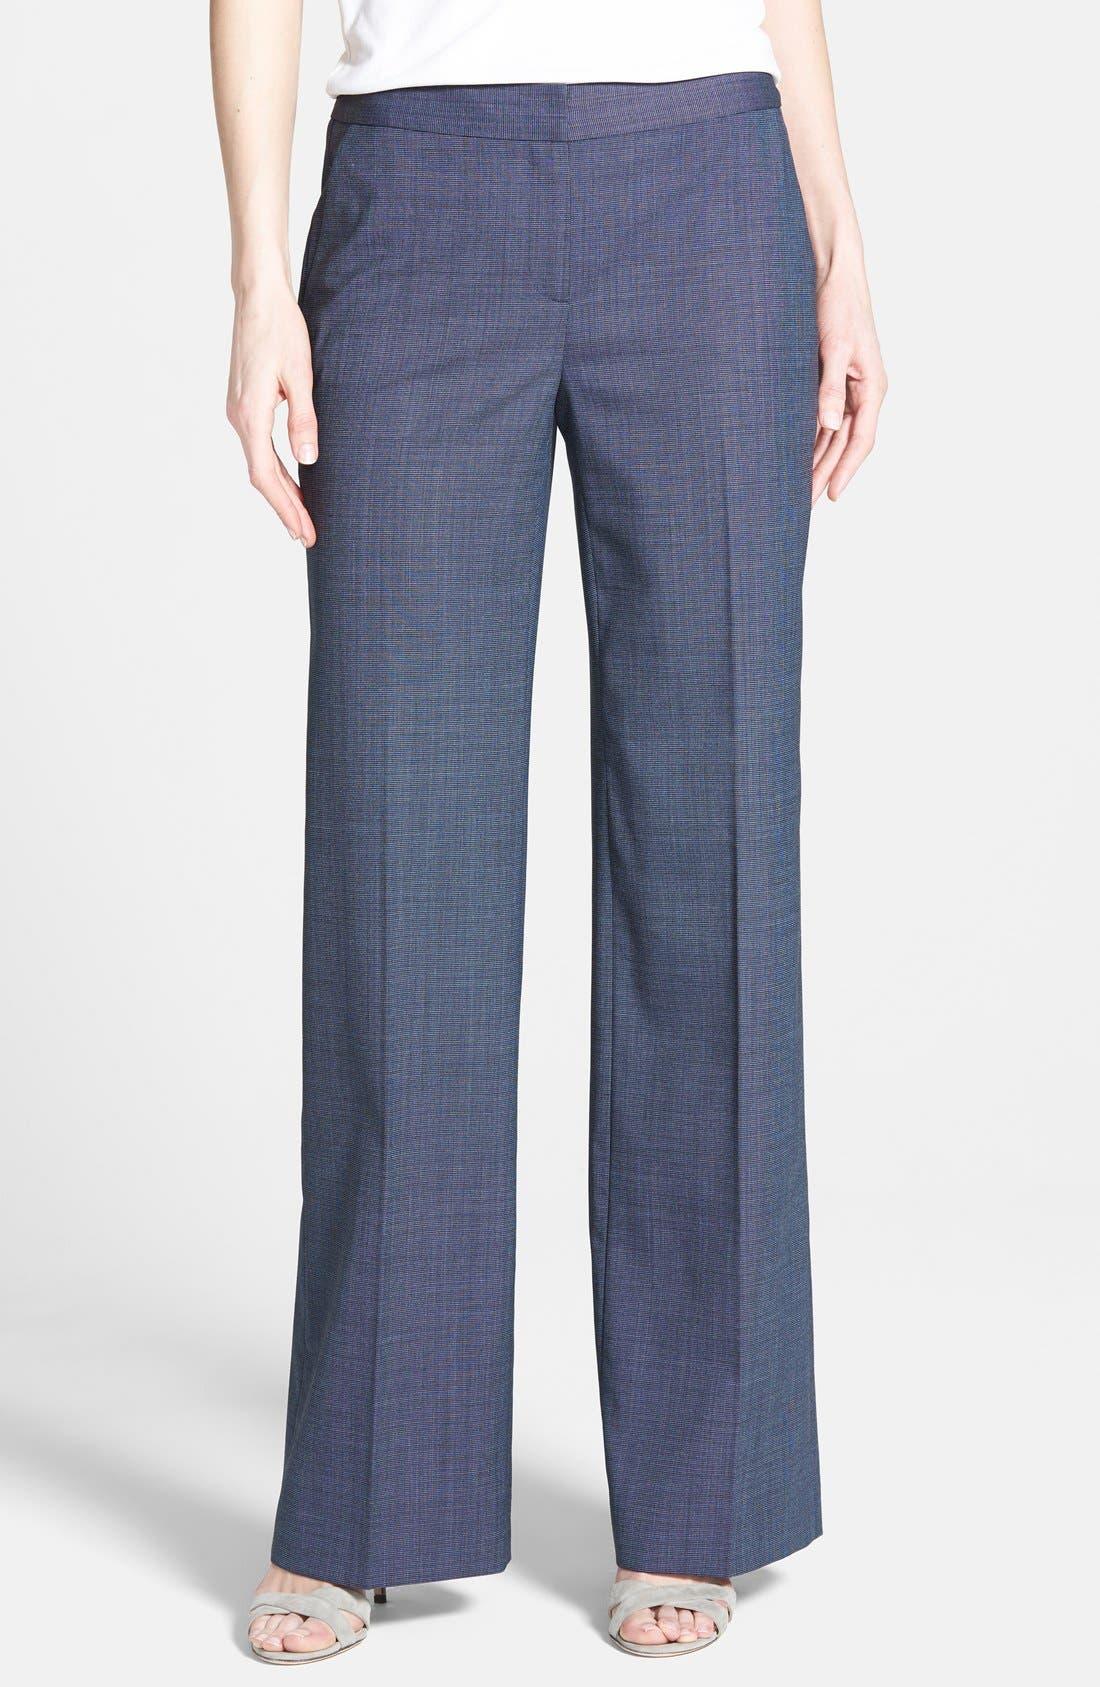 Alternate Image 1 Selected - Classiques Entier® Suiting Trousers (Regular & Petite)